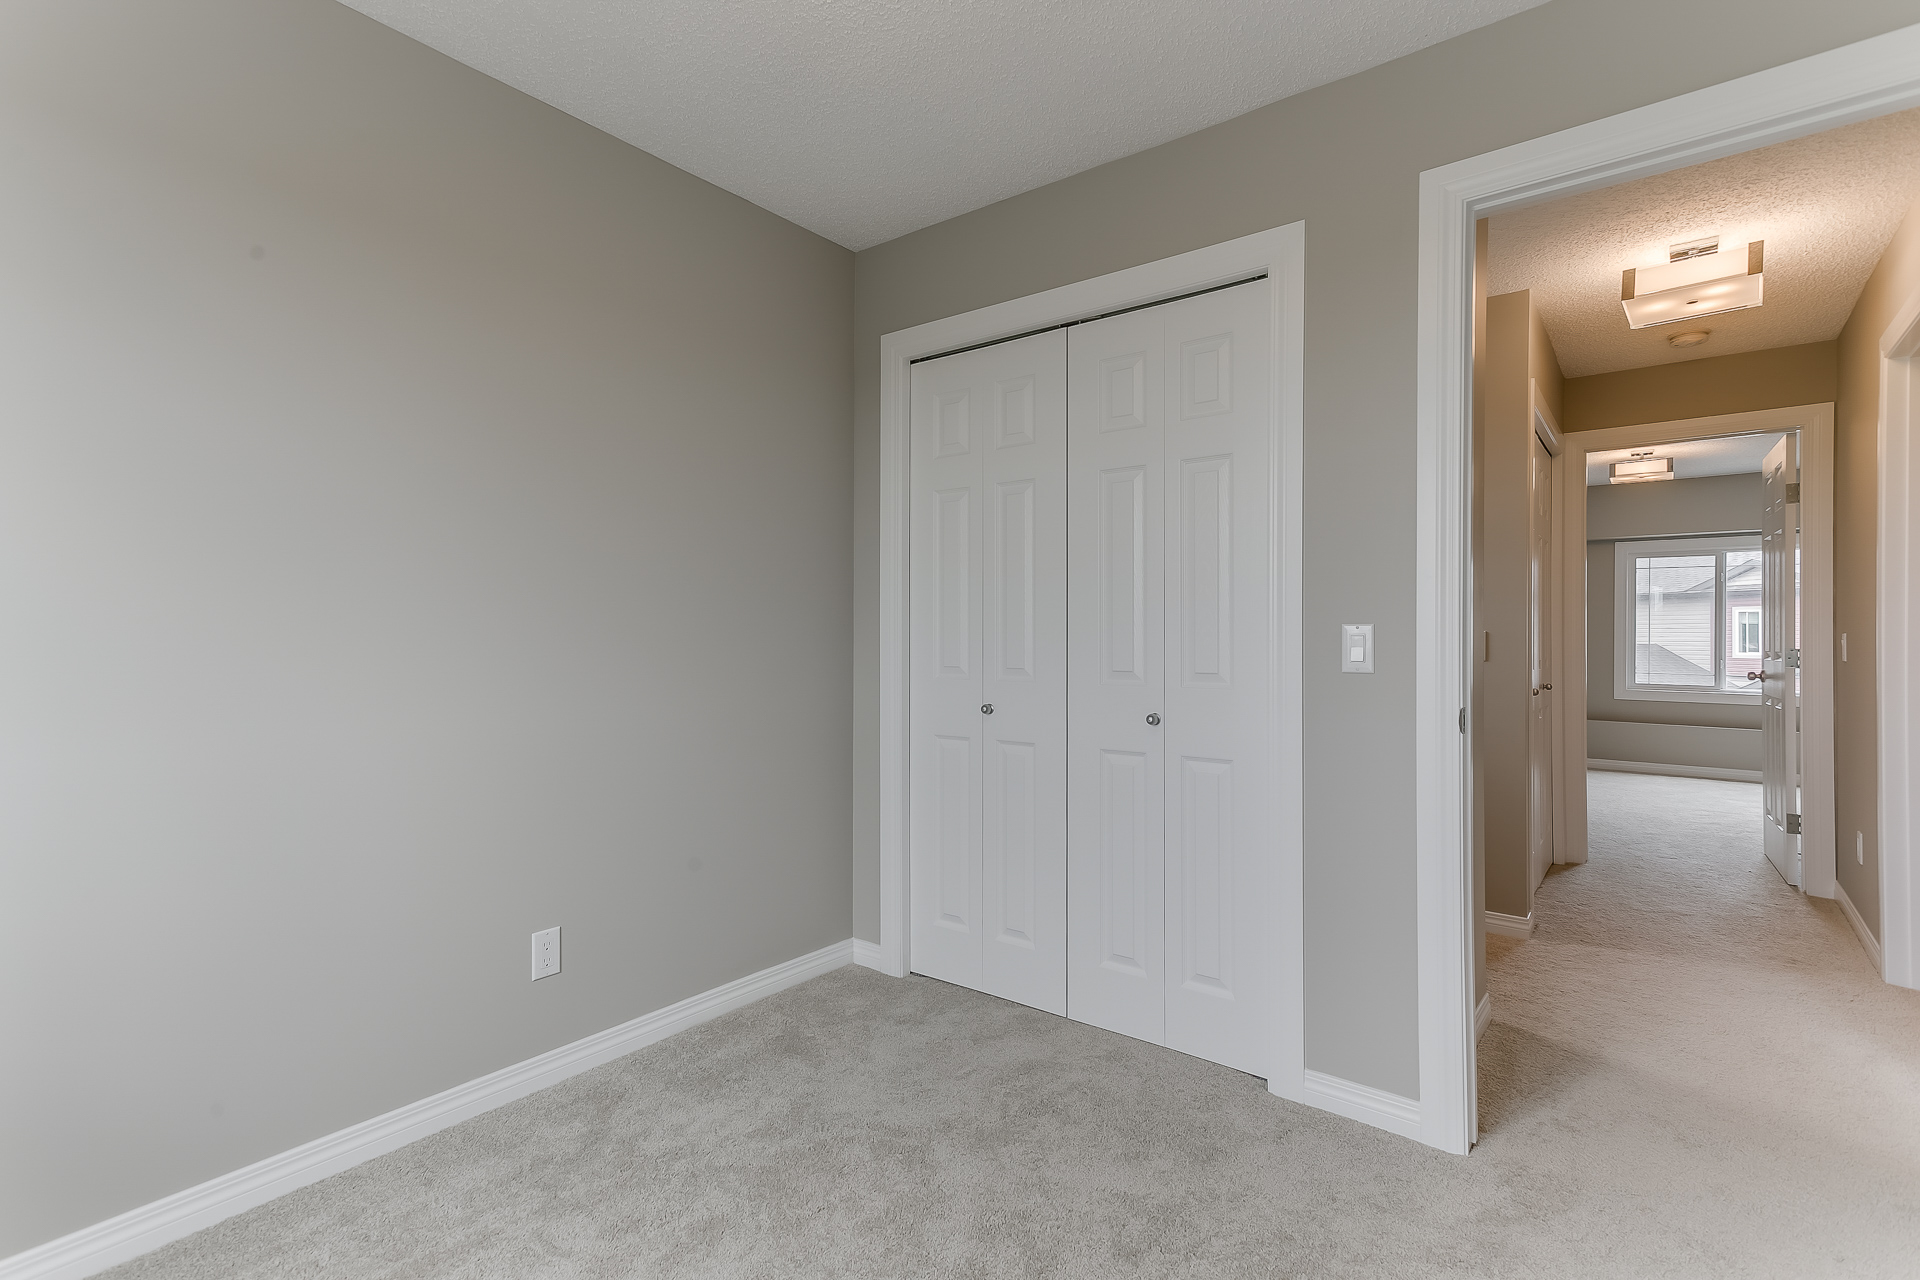 Right Bedroom Closet